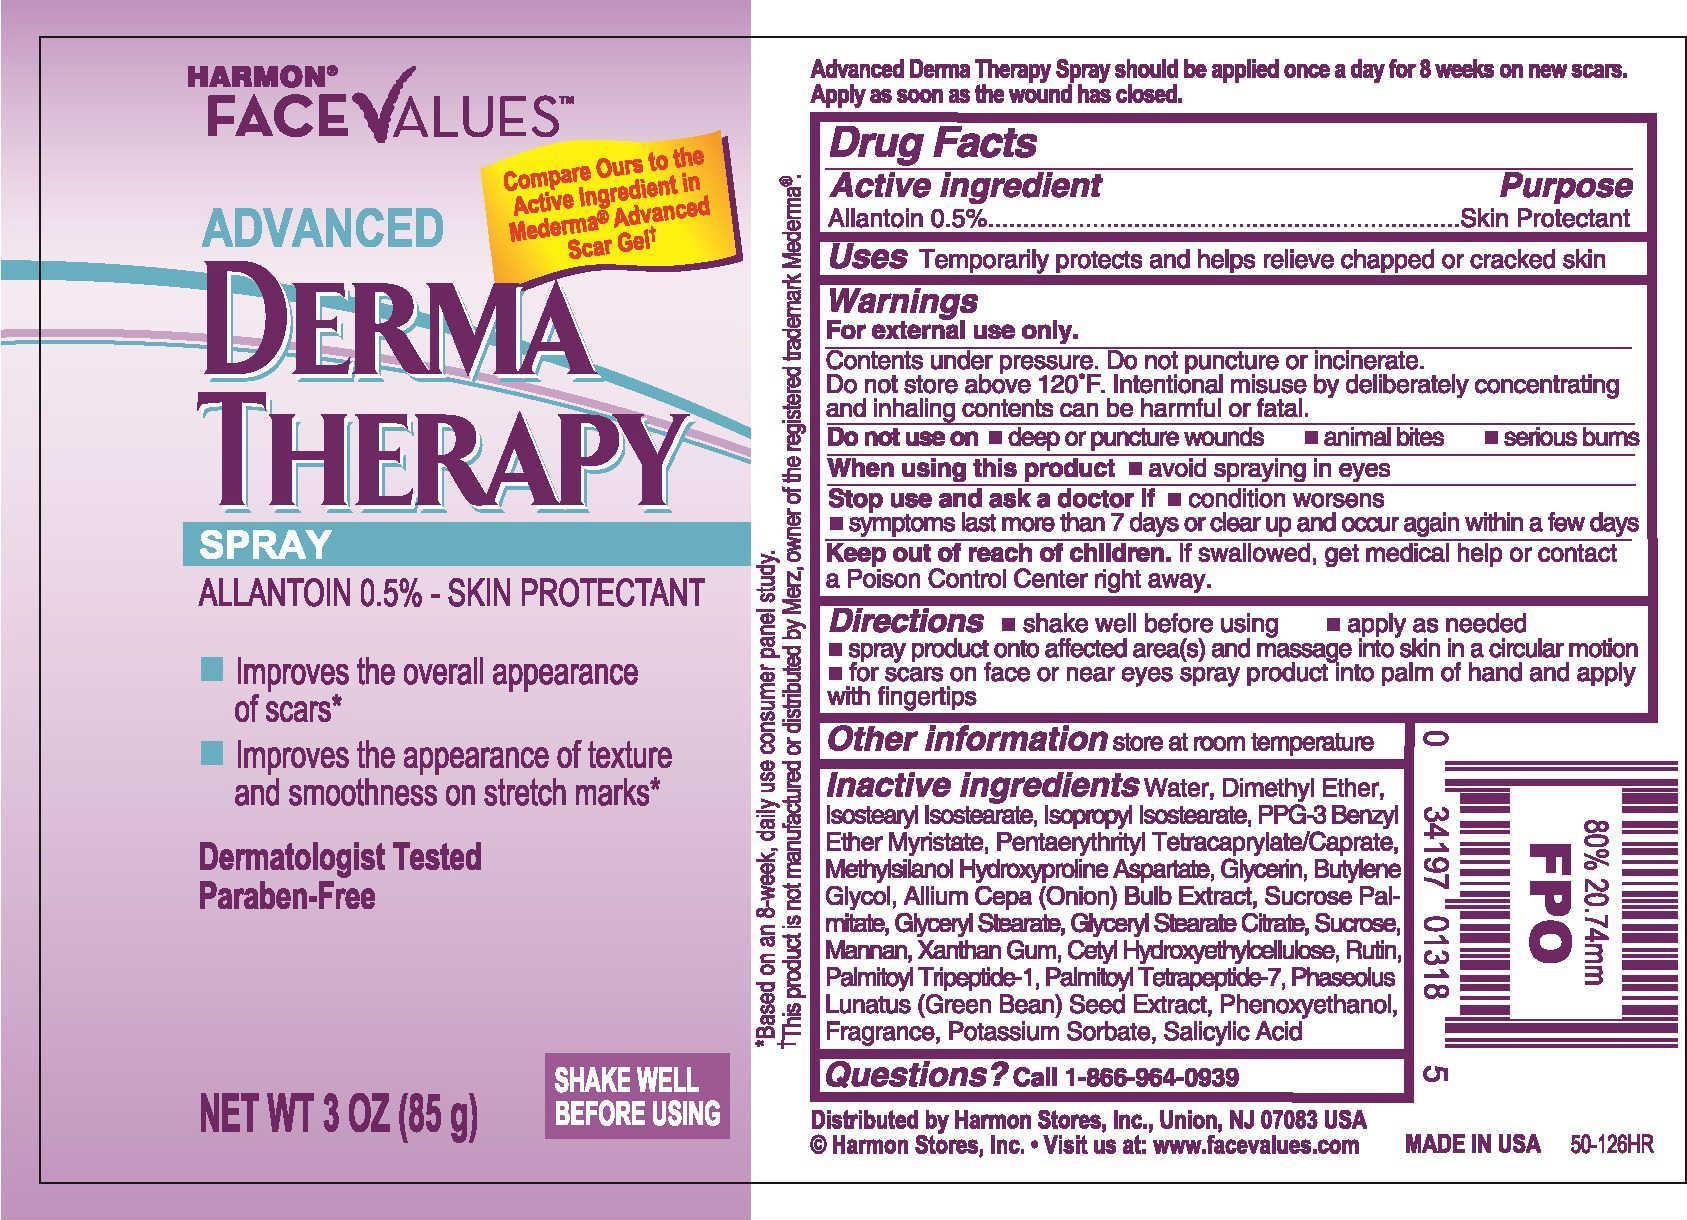 Derma Therapy Spray - Harmon.jpg